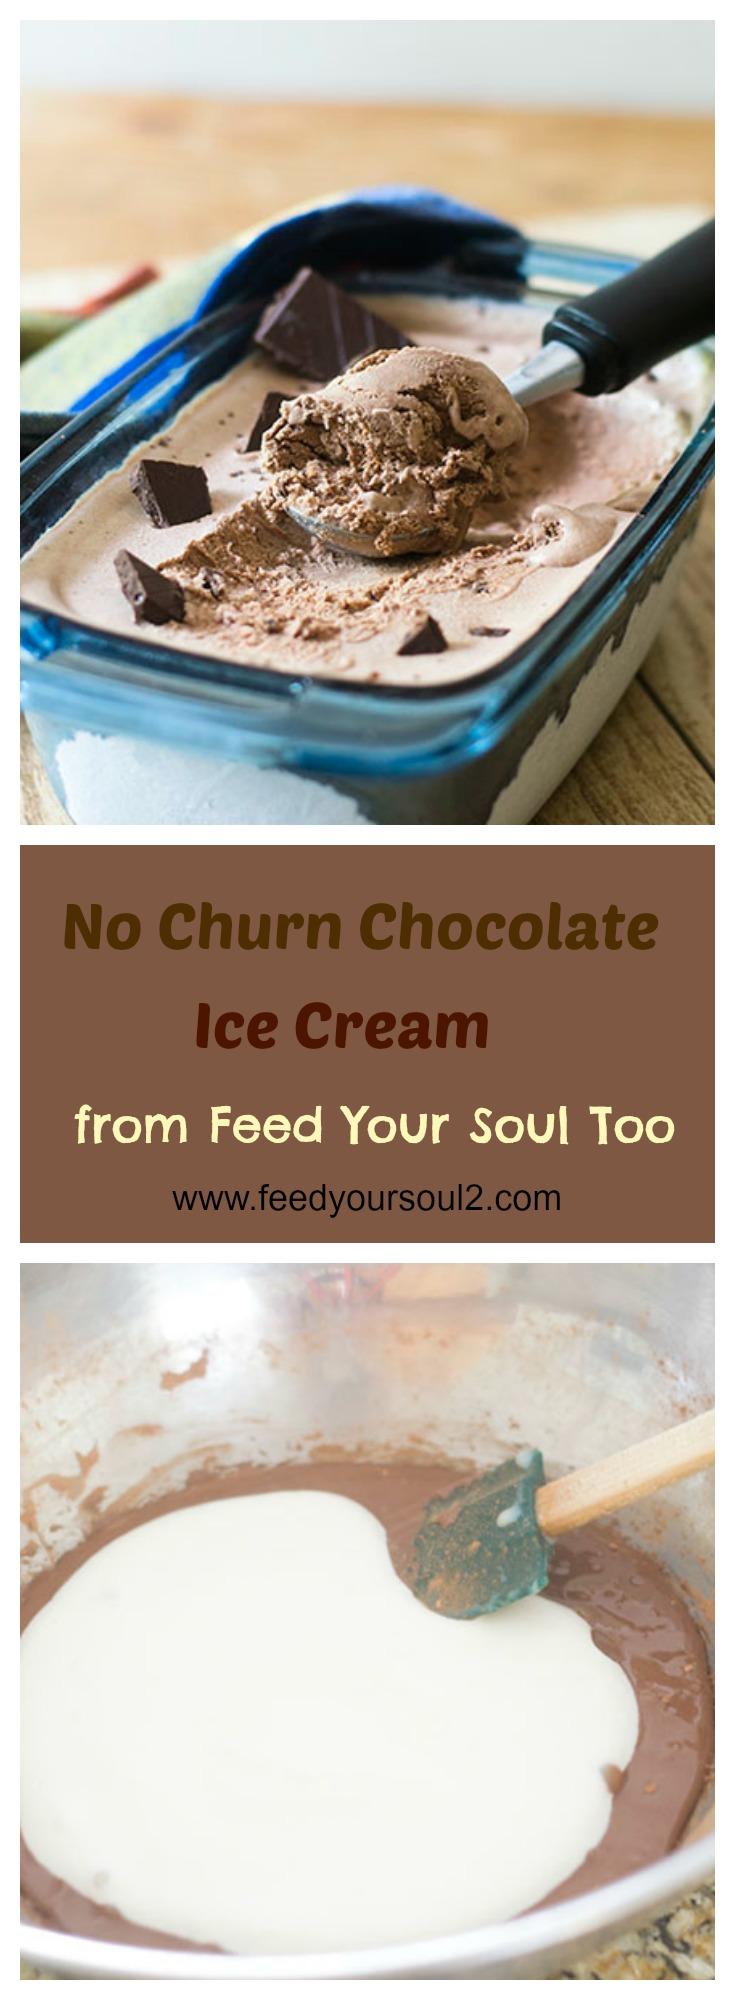 No Churn Chocolate Ice Cream #Dessert #chocolate #Icecream | feedyoursoul2.com